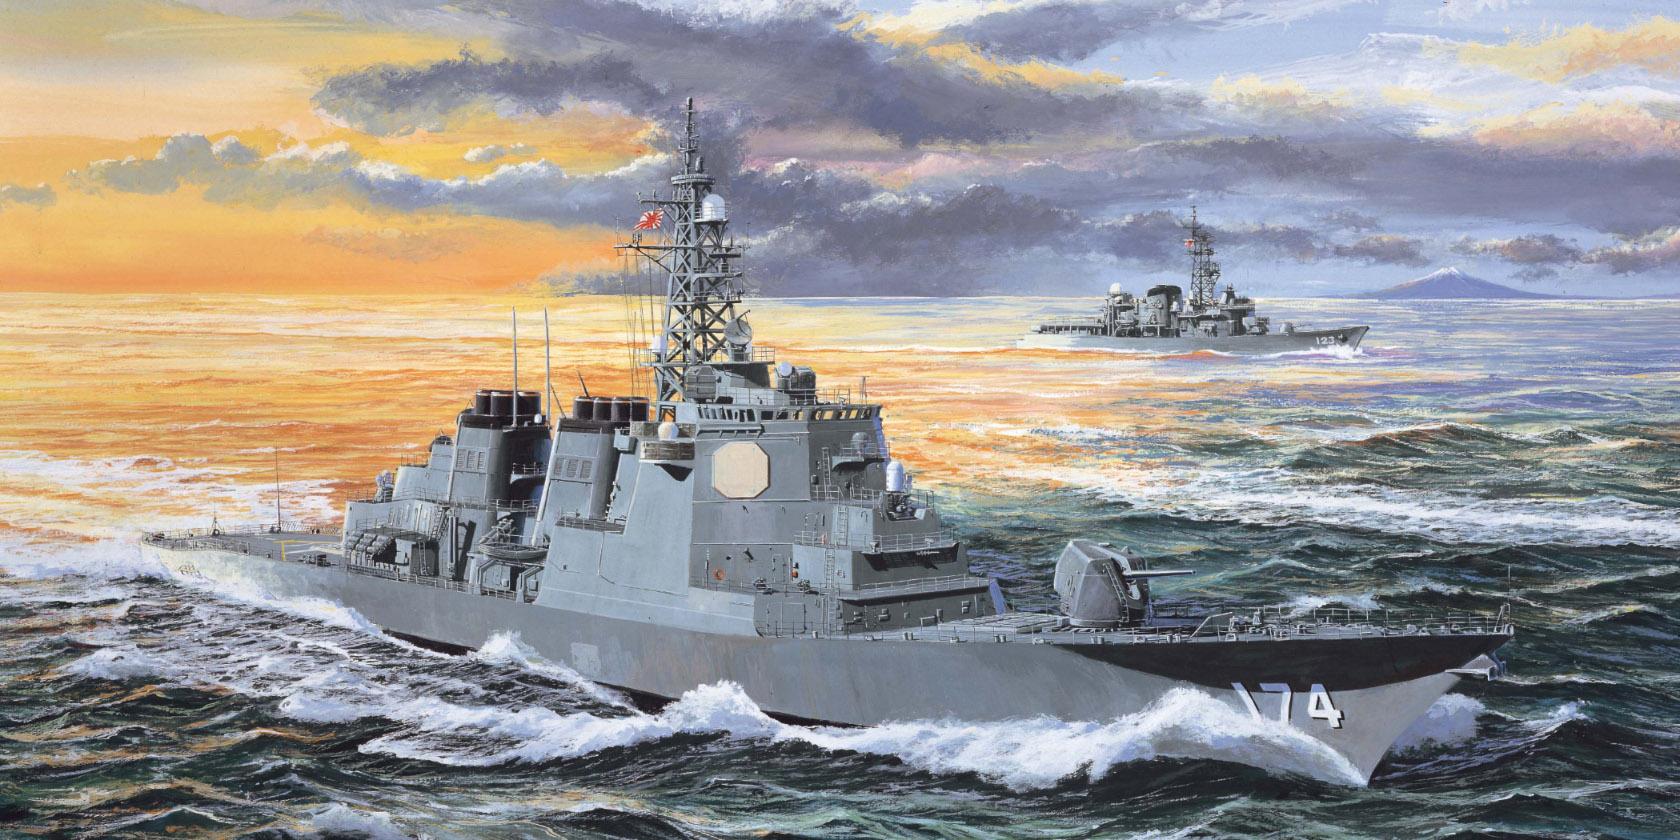 рисунок JMSDF DDG-174 Kirishima